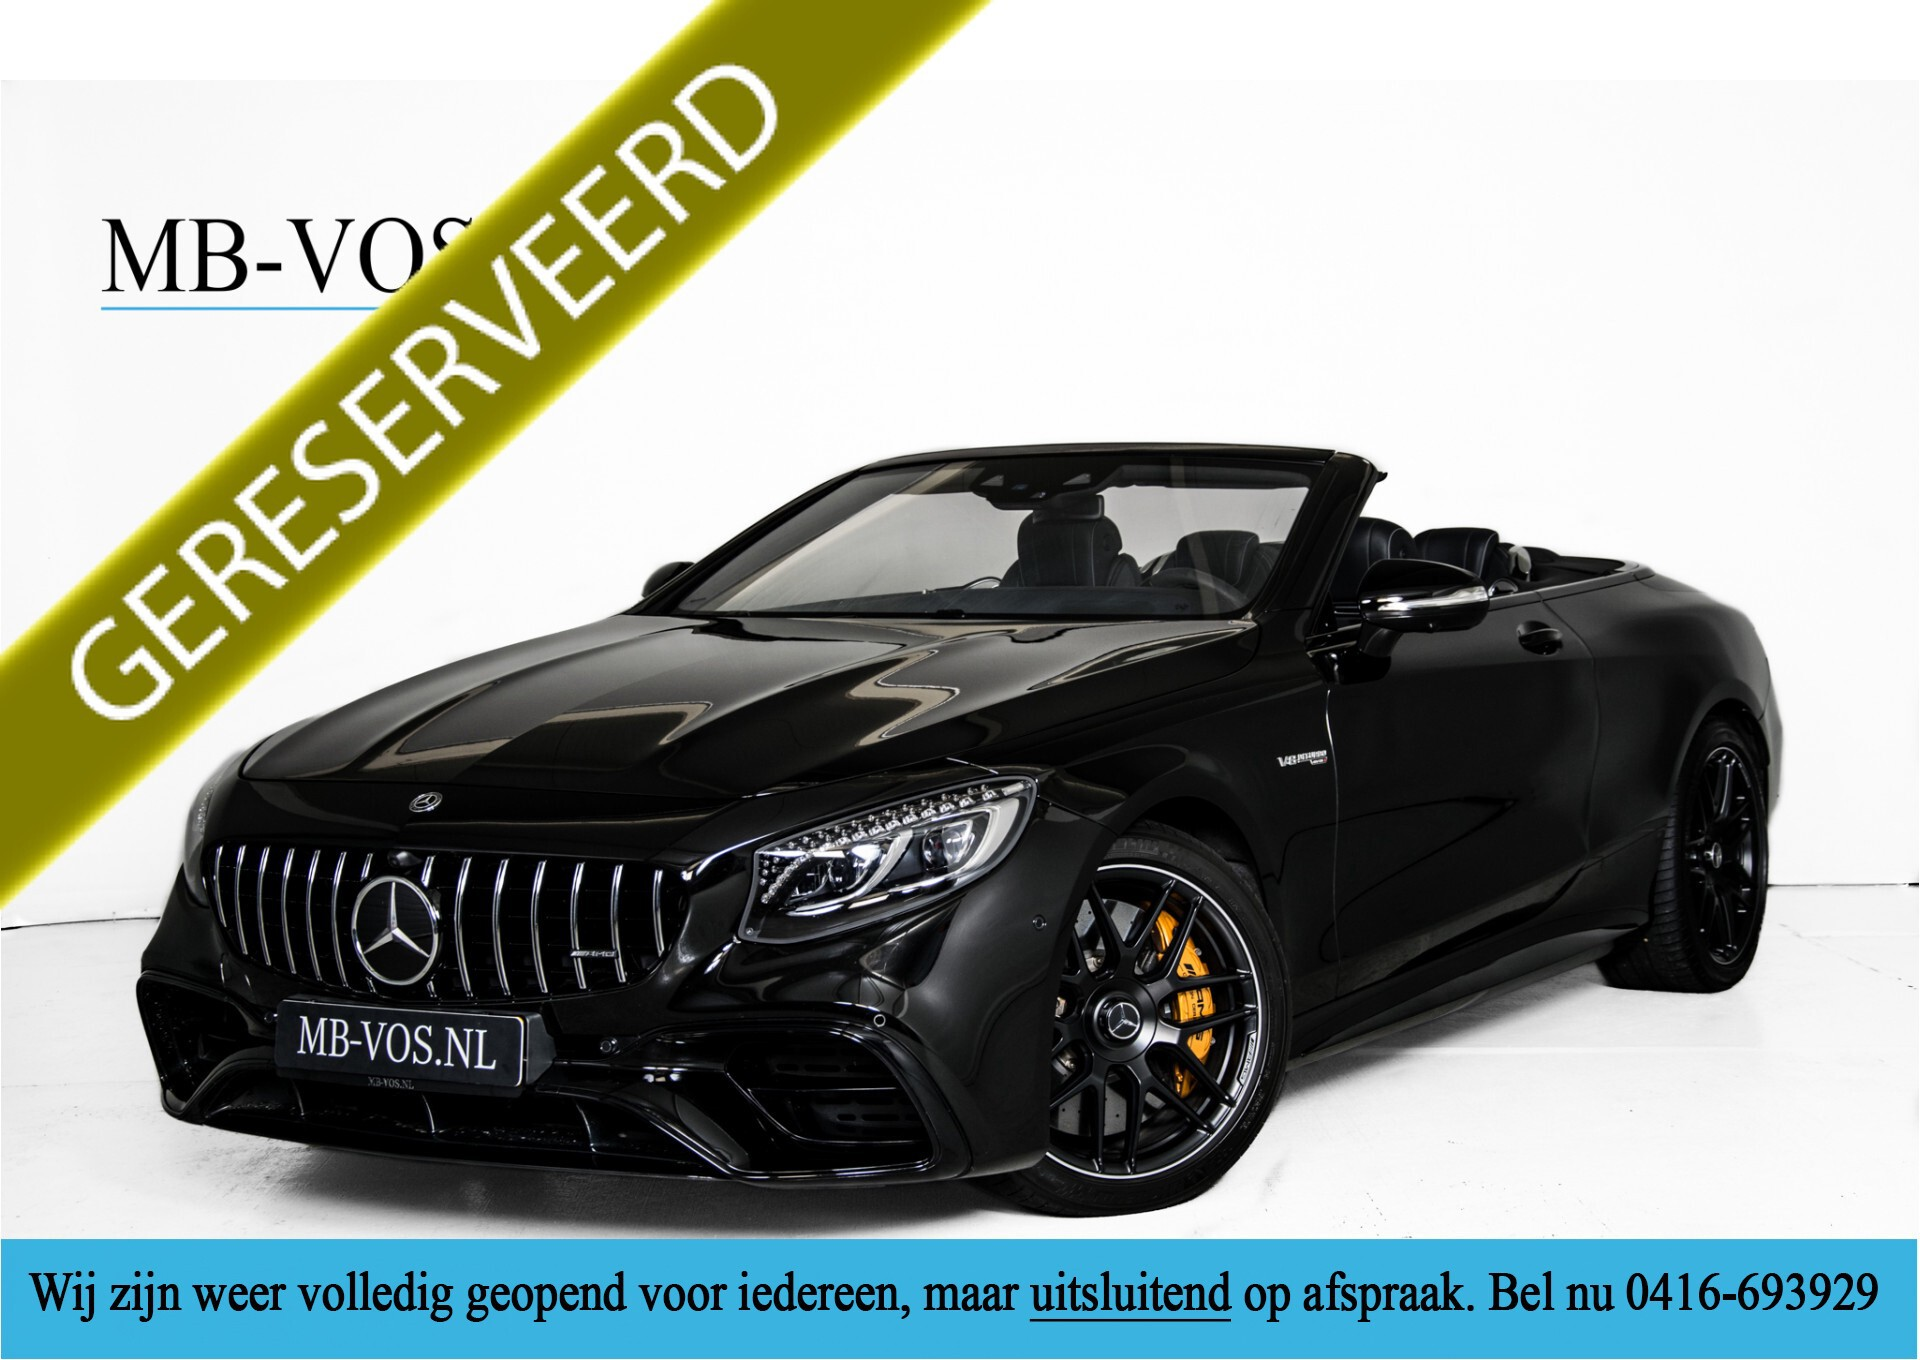 Mercedes-Benz S-Klasse Cabrio 63 AMG 4M+ Keramisch/Burmester High End 3D/Carbon/Driverspack/Blackpack Aut9 Foto 1